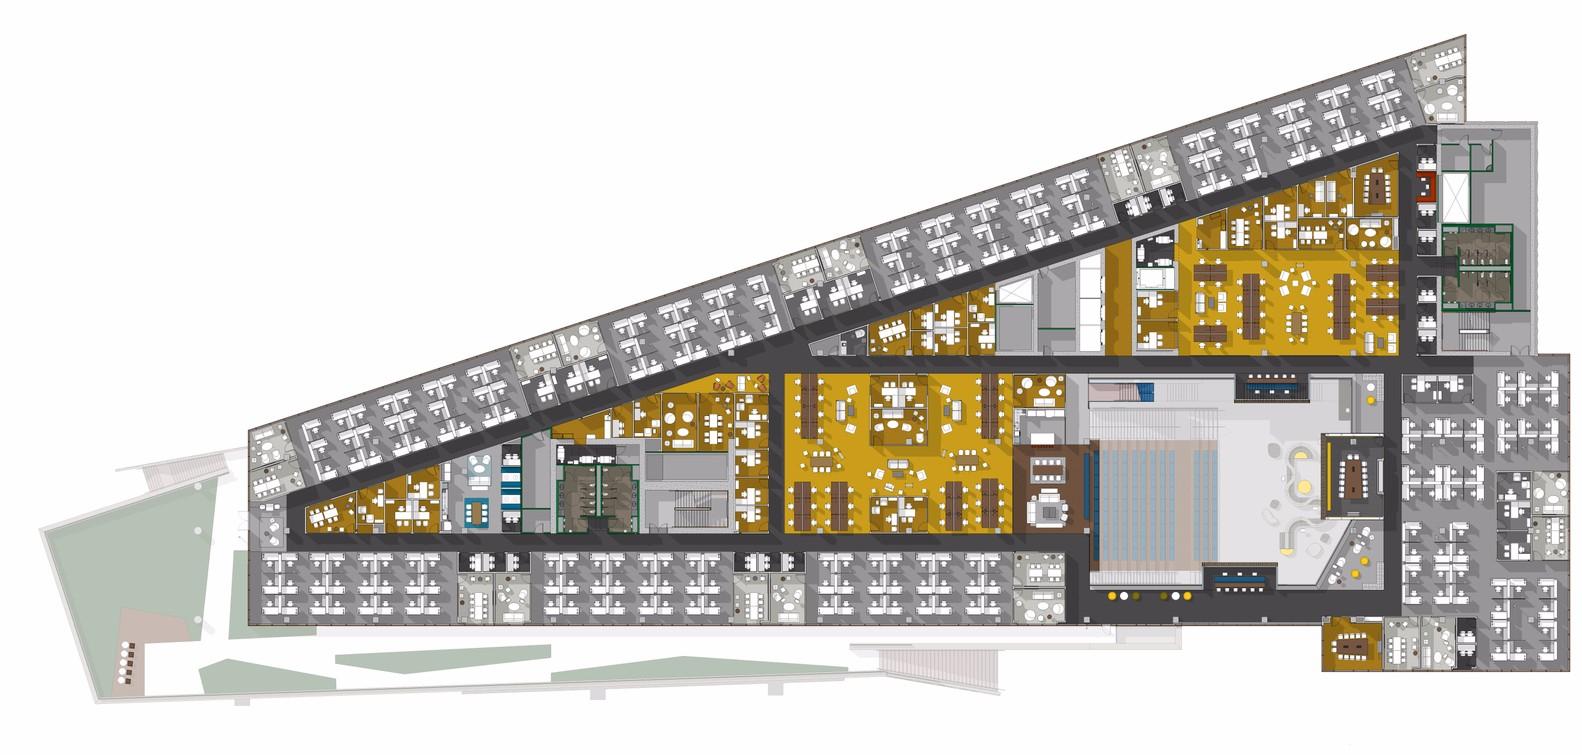 Intuit海洋路大廈——探索可持續的公共參與型發展模式插图19